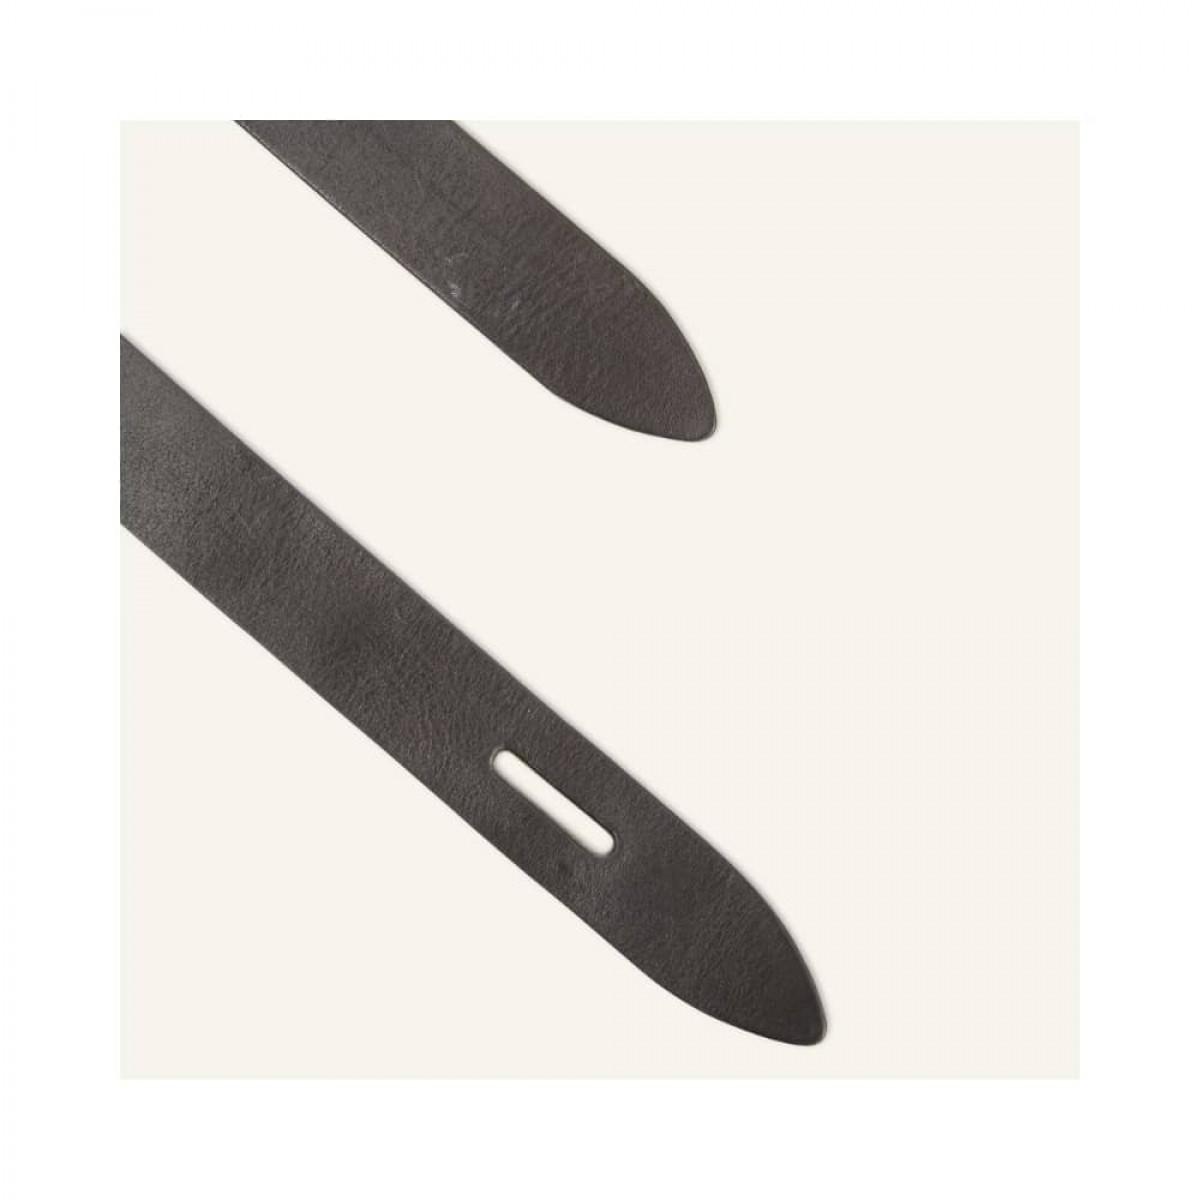 lecce bælte - black - detalje 1